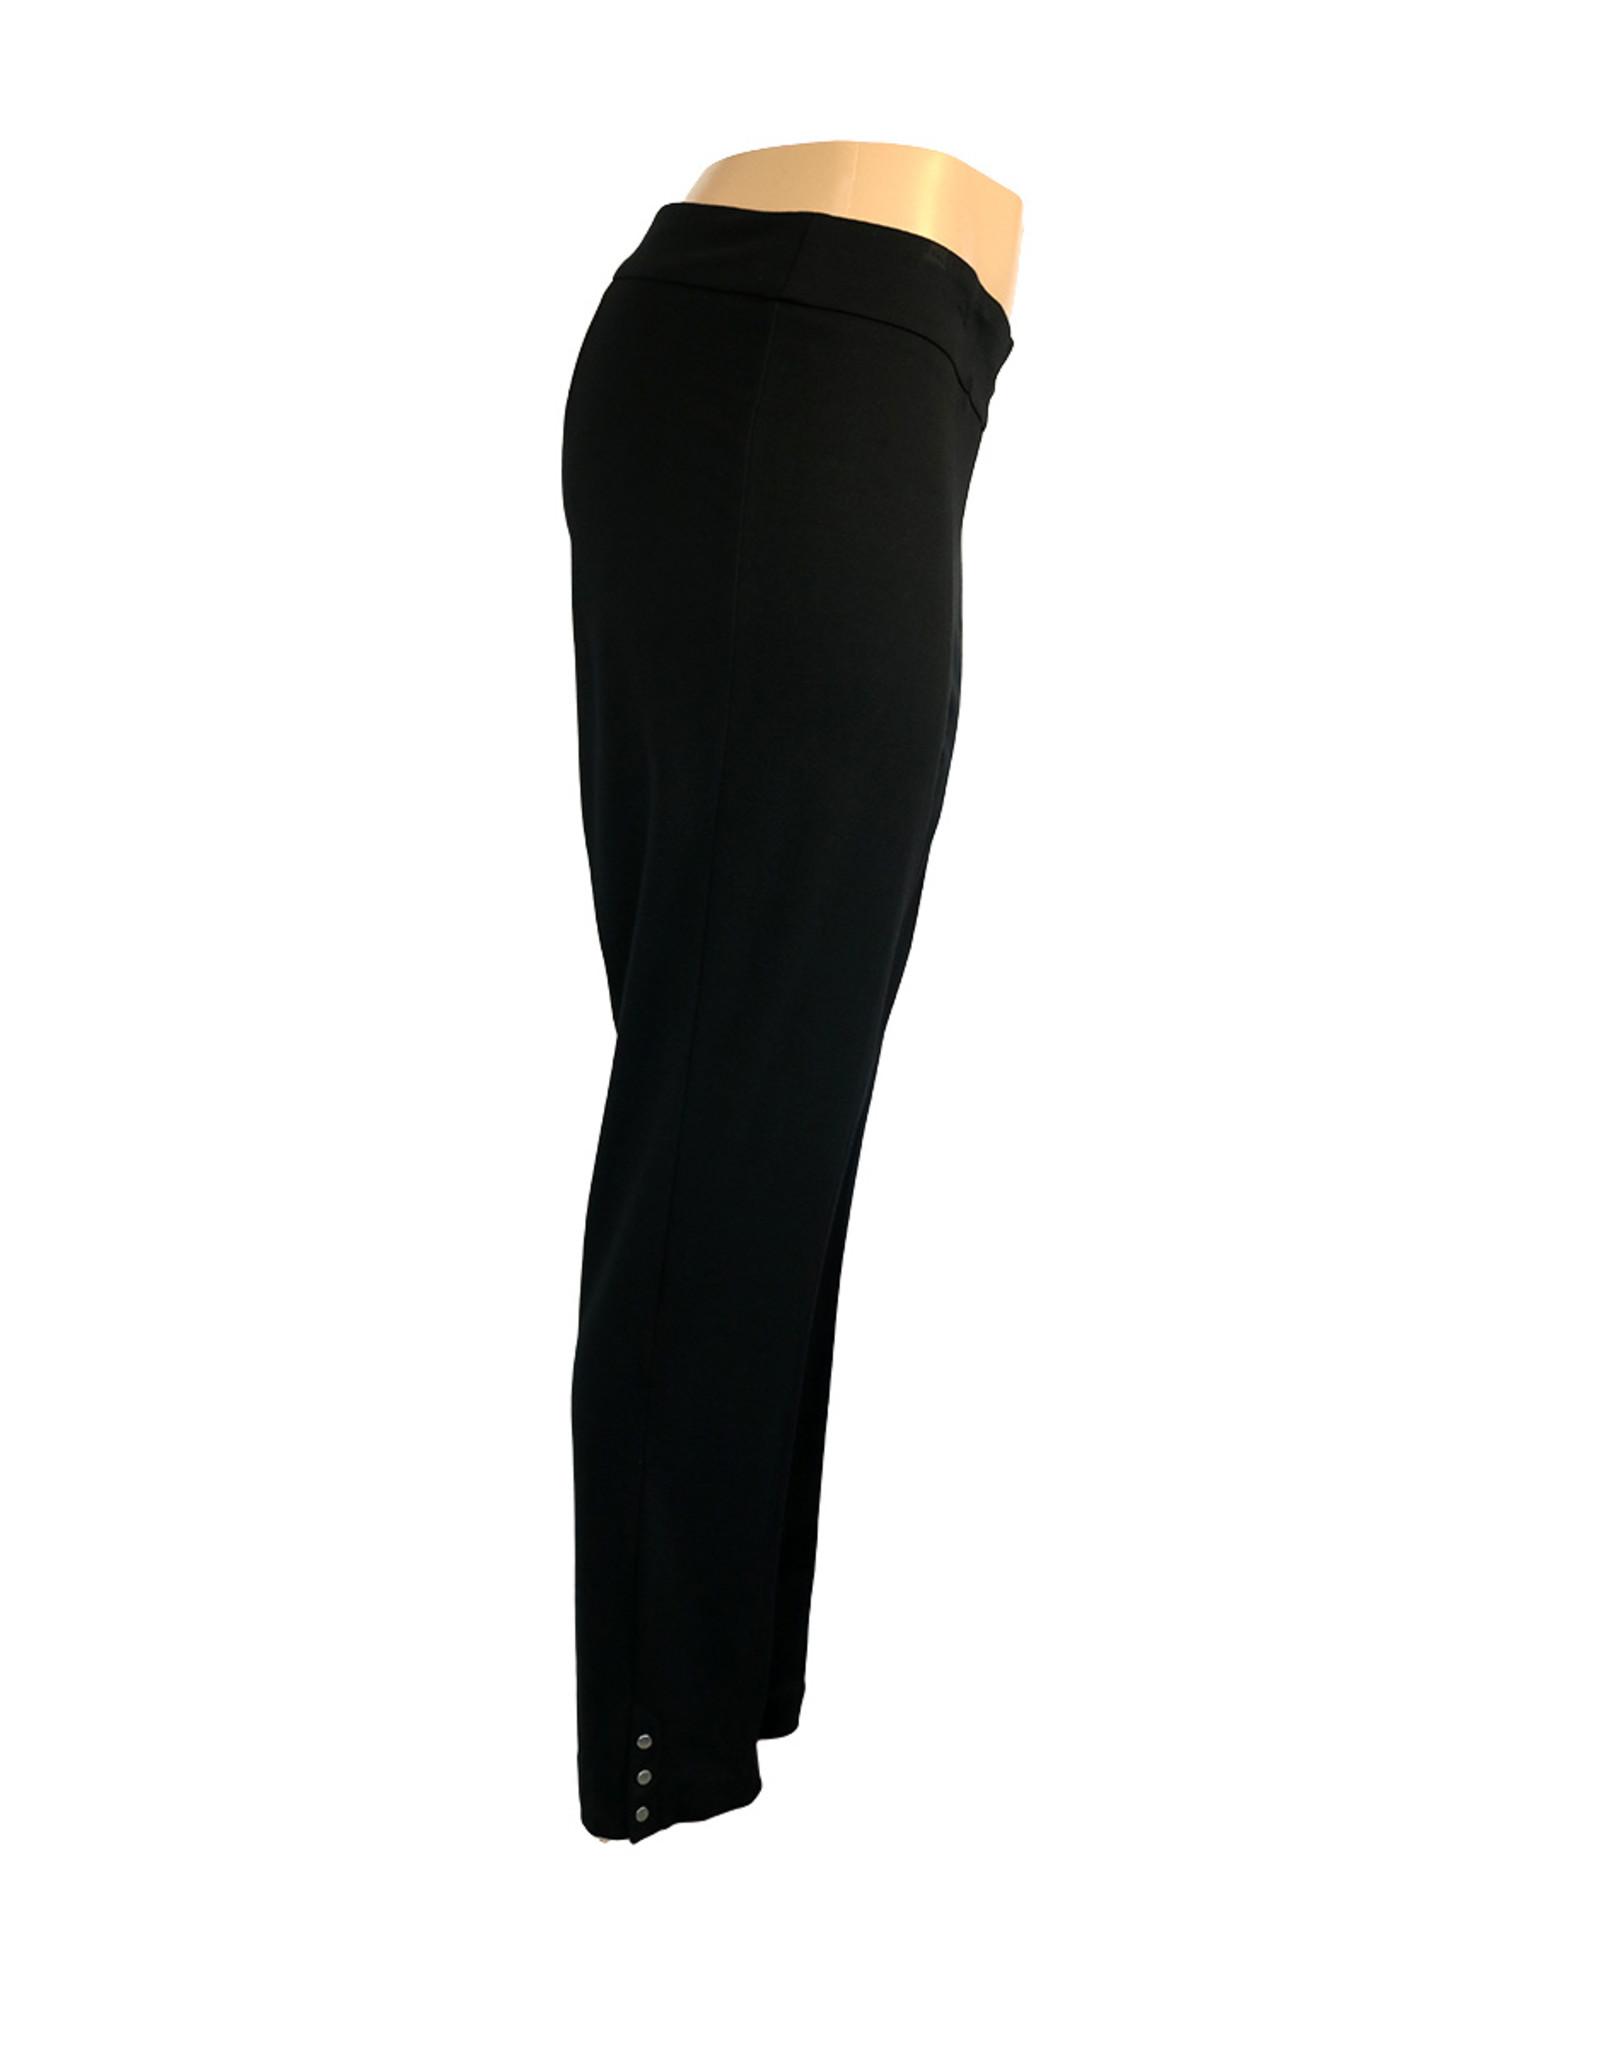 NTouch Curtain Call Slim Pant 5993